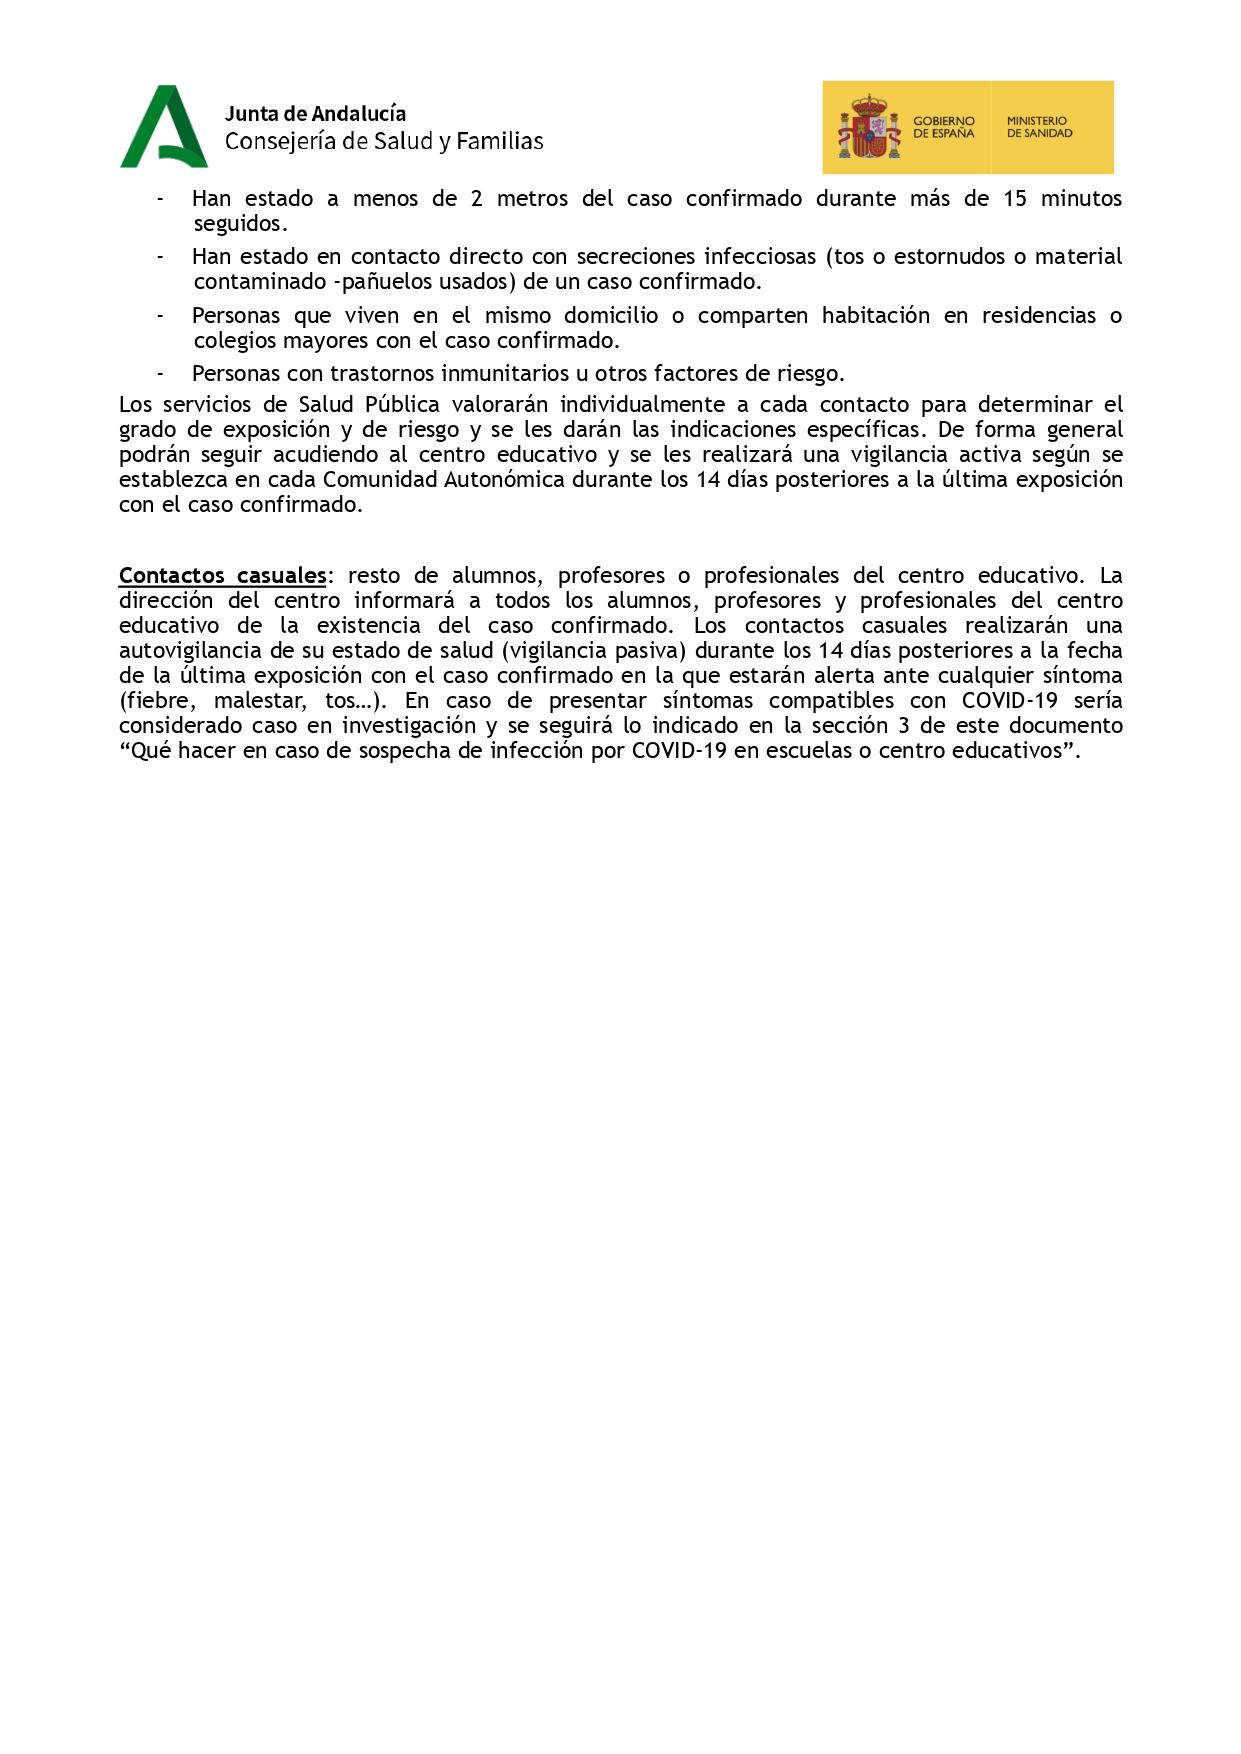 GuiaCentrosEducativosANDALUCIA_page-0003